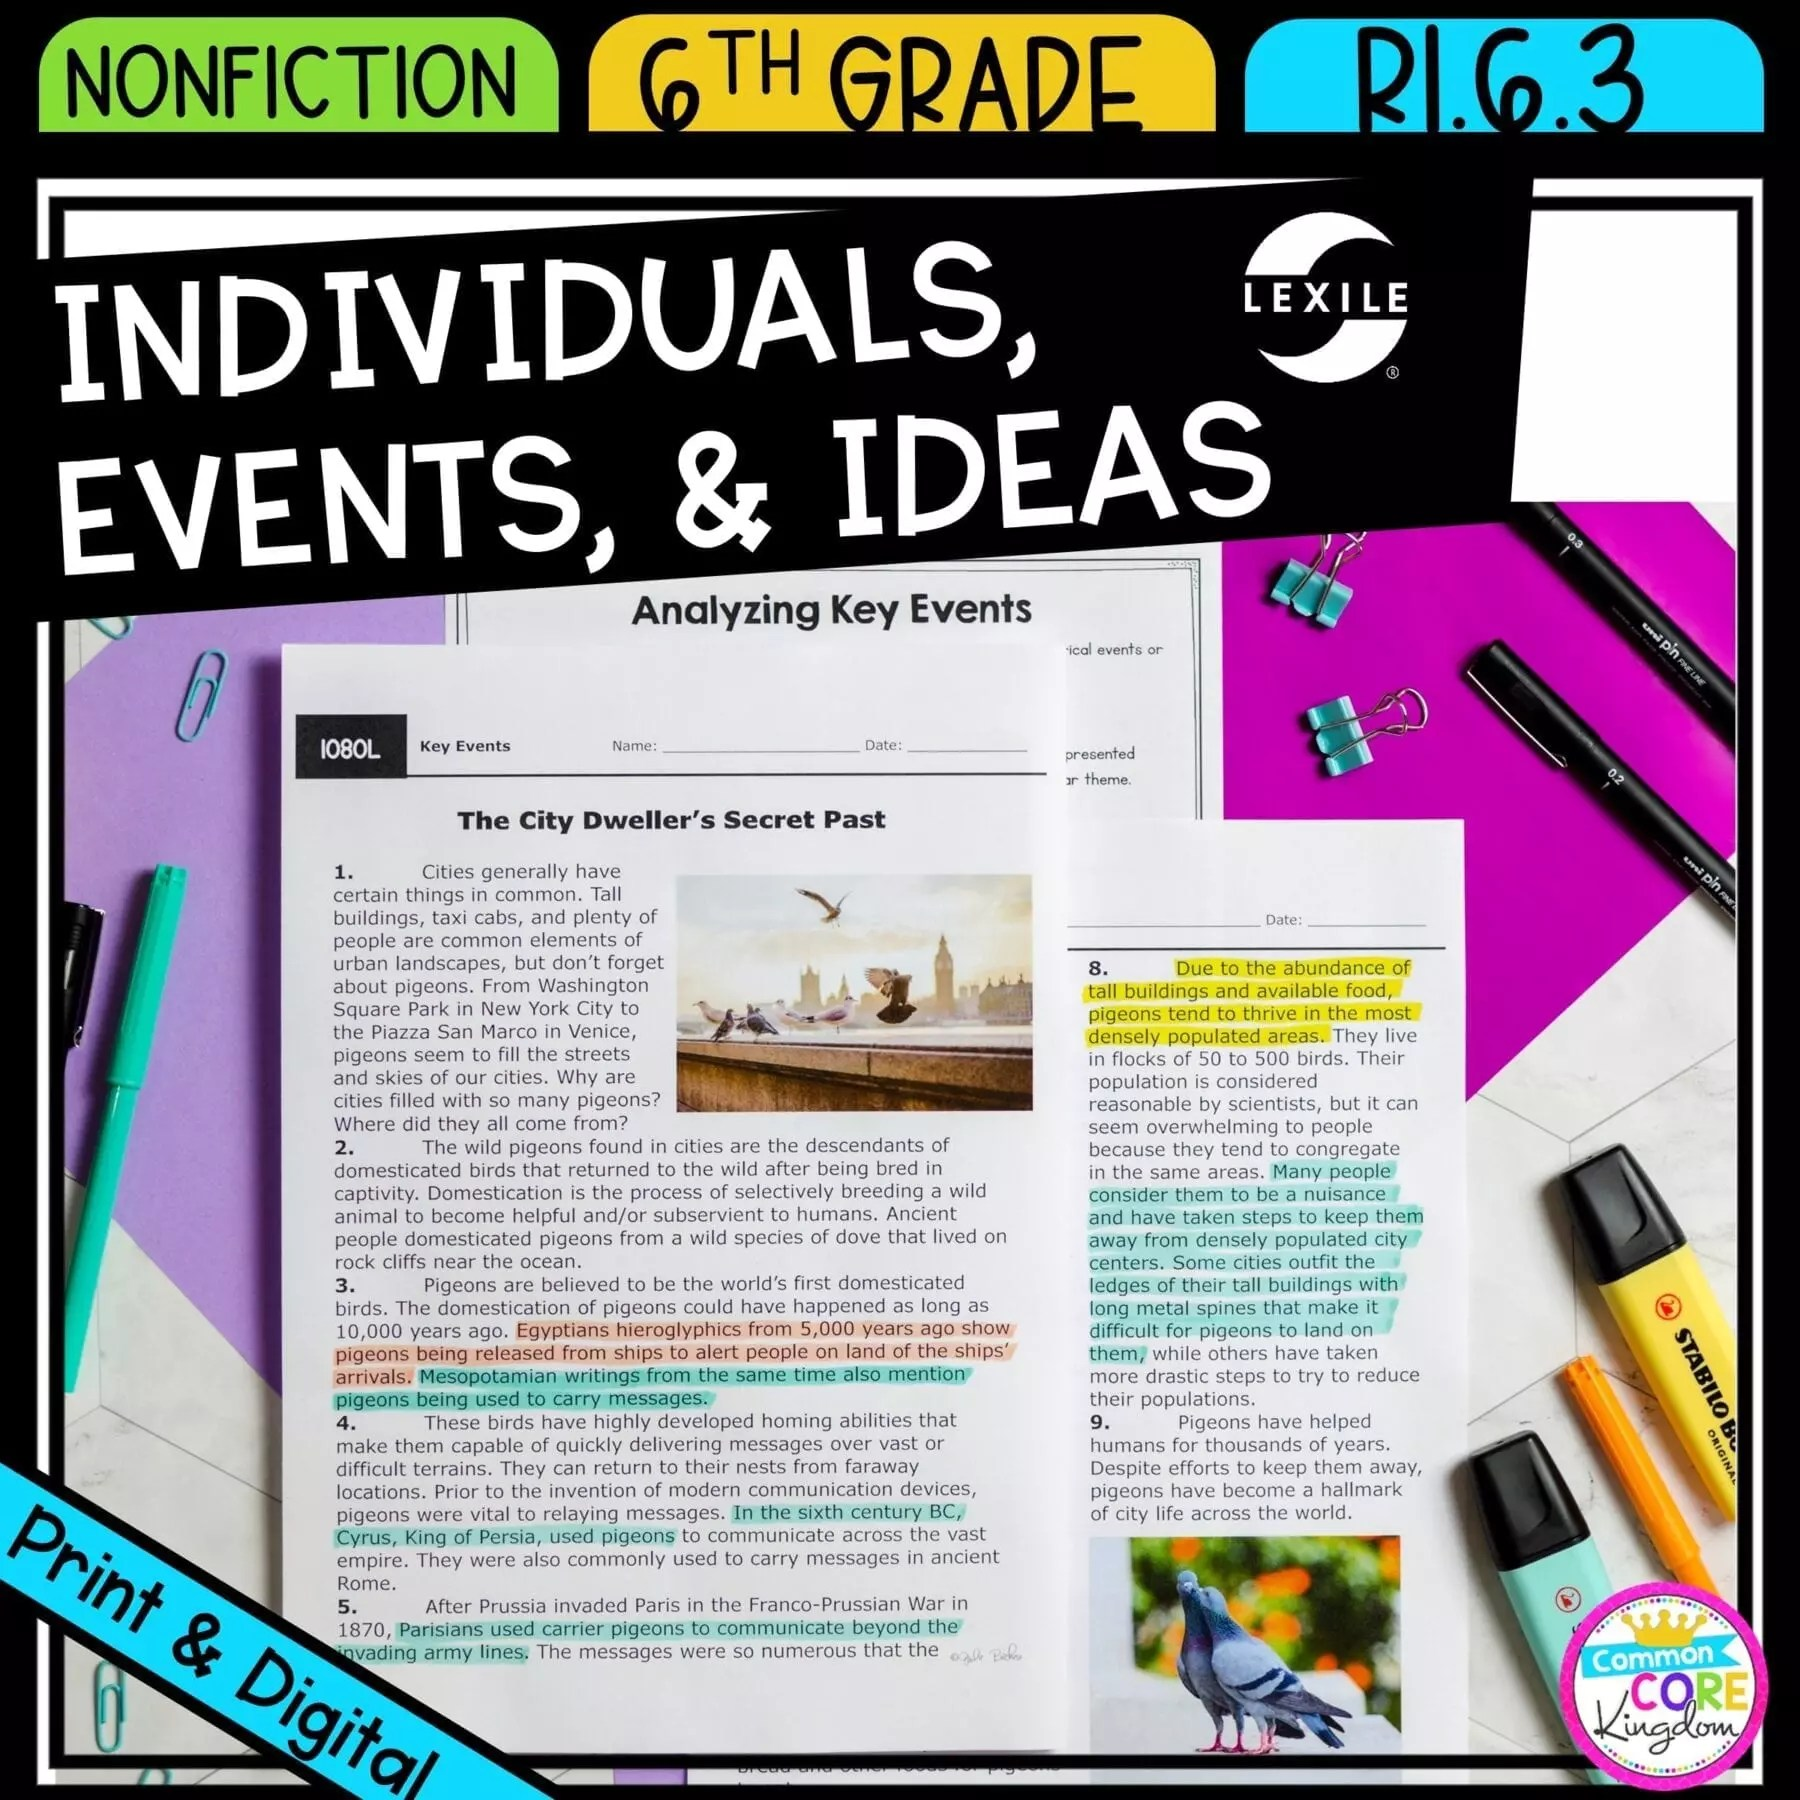 medium resolution of Key Individuals Events \u0026 Ideas 6th Grade RI.6.3   Common Core Kingdom